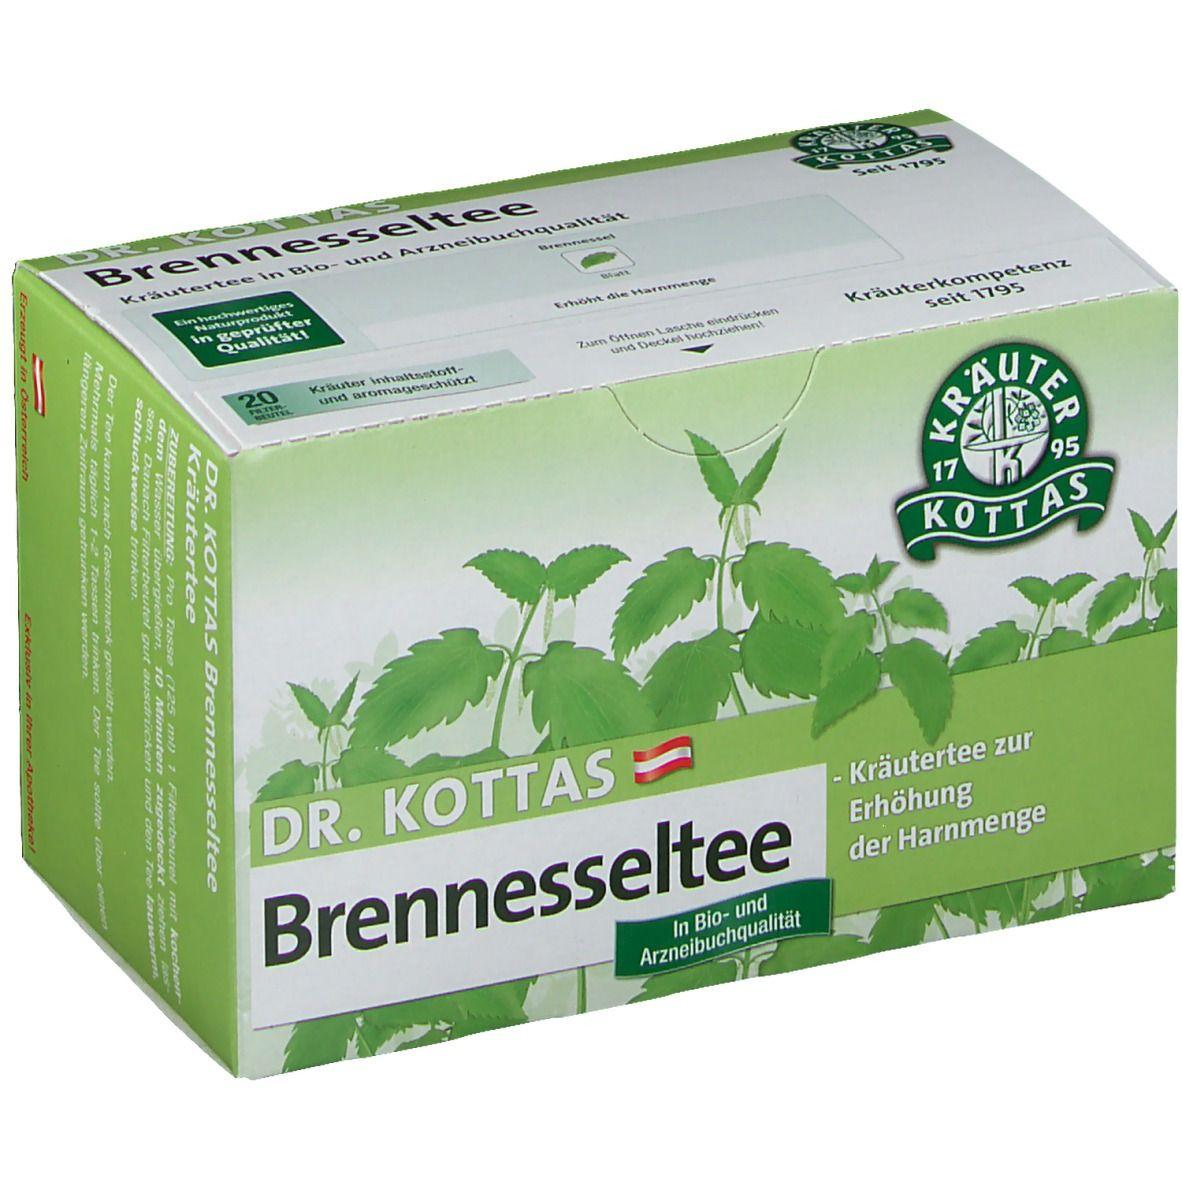 Dr. Kottas Brennesseltee Filterbeutel